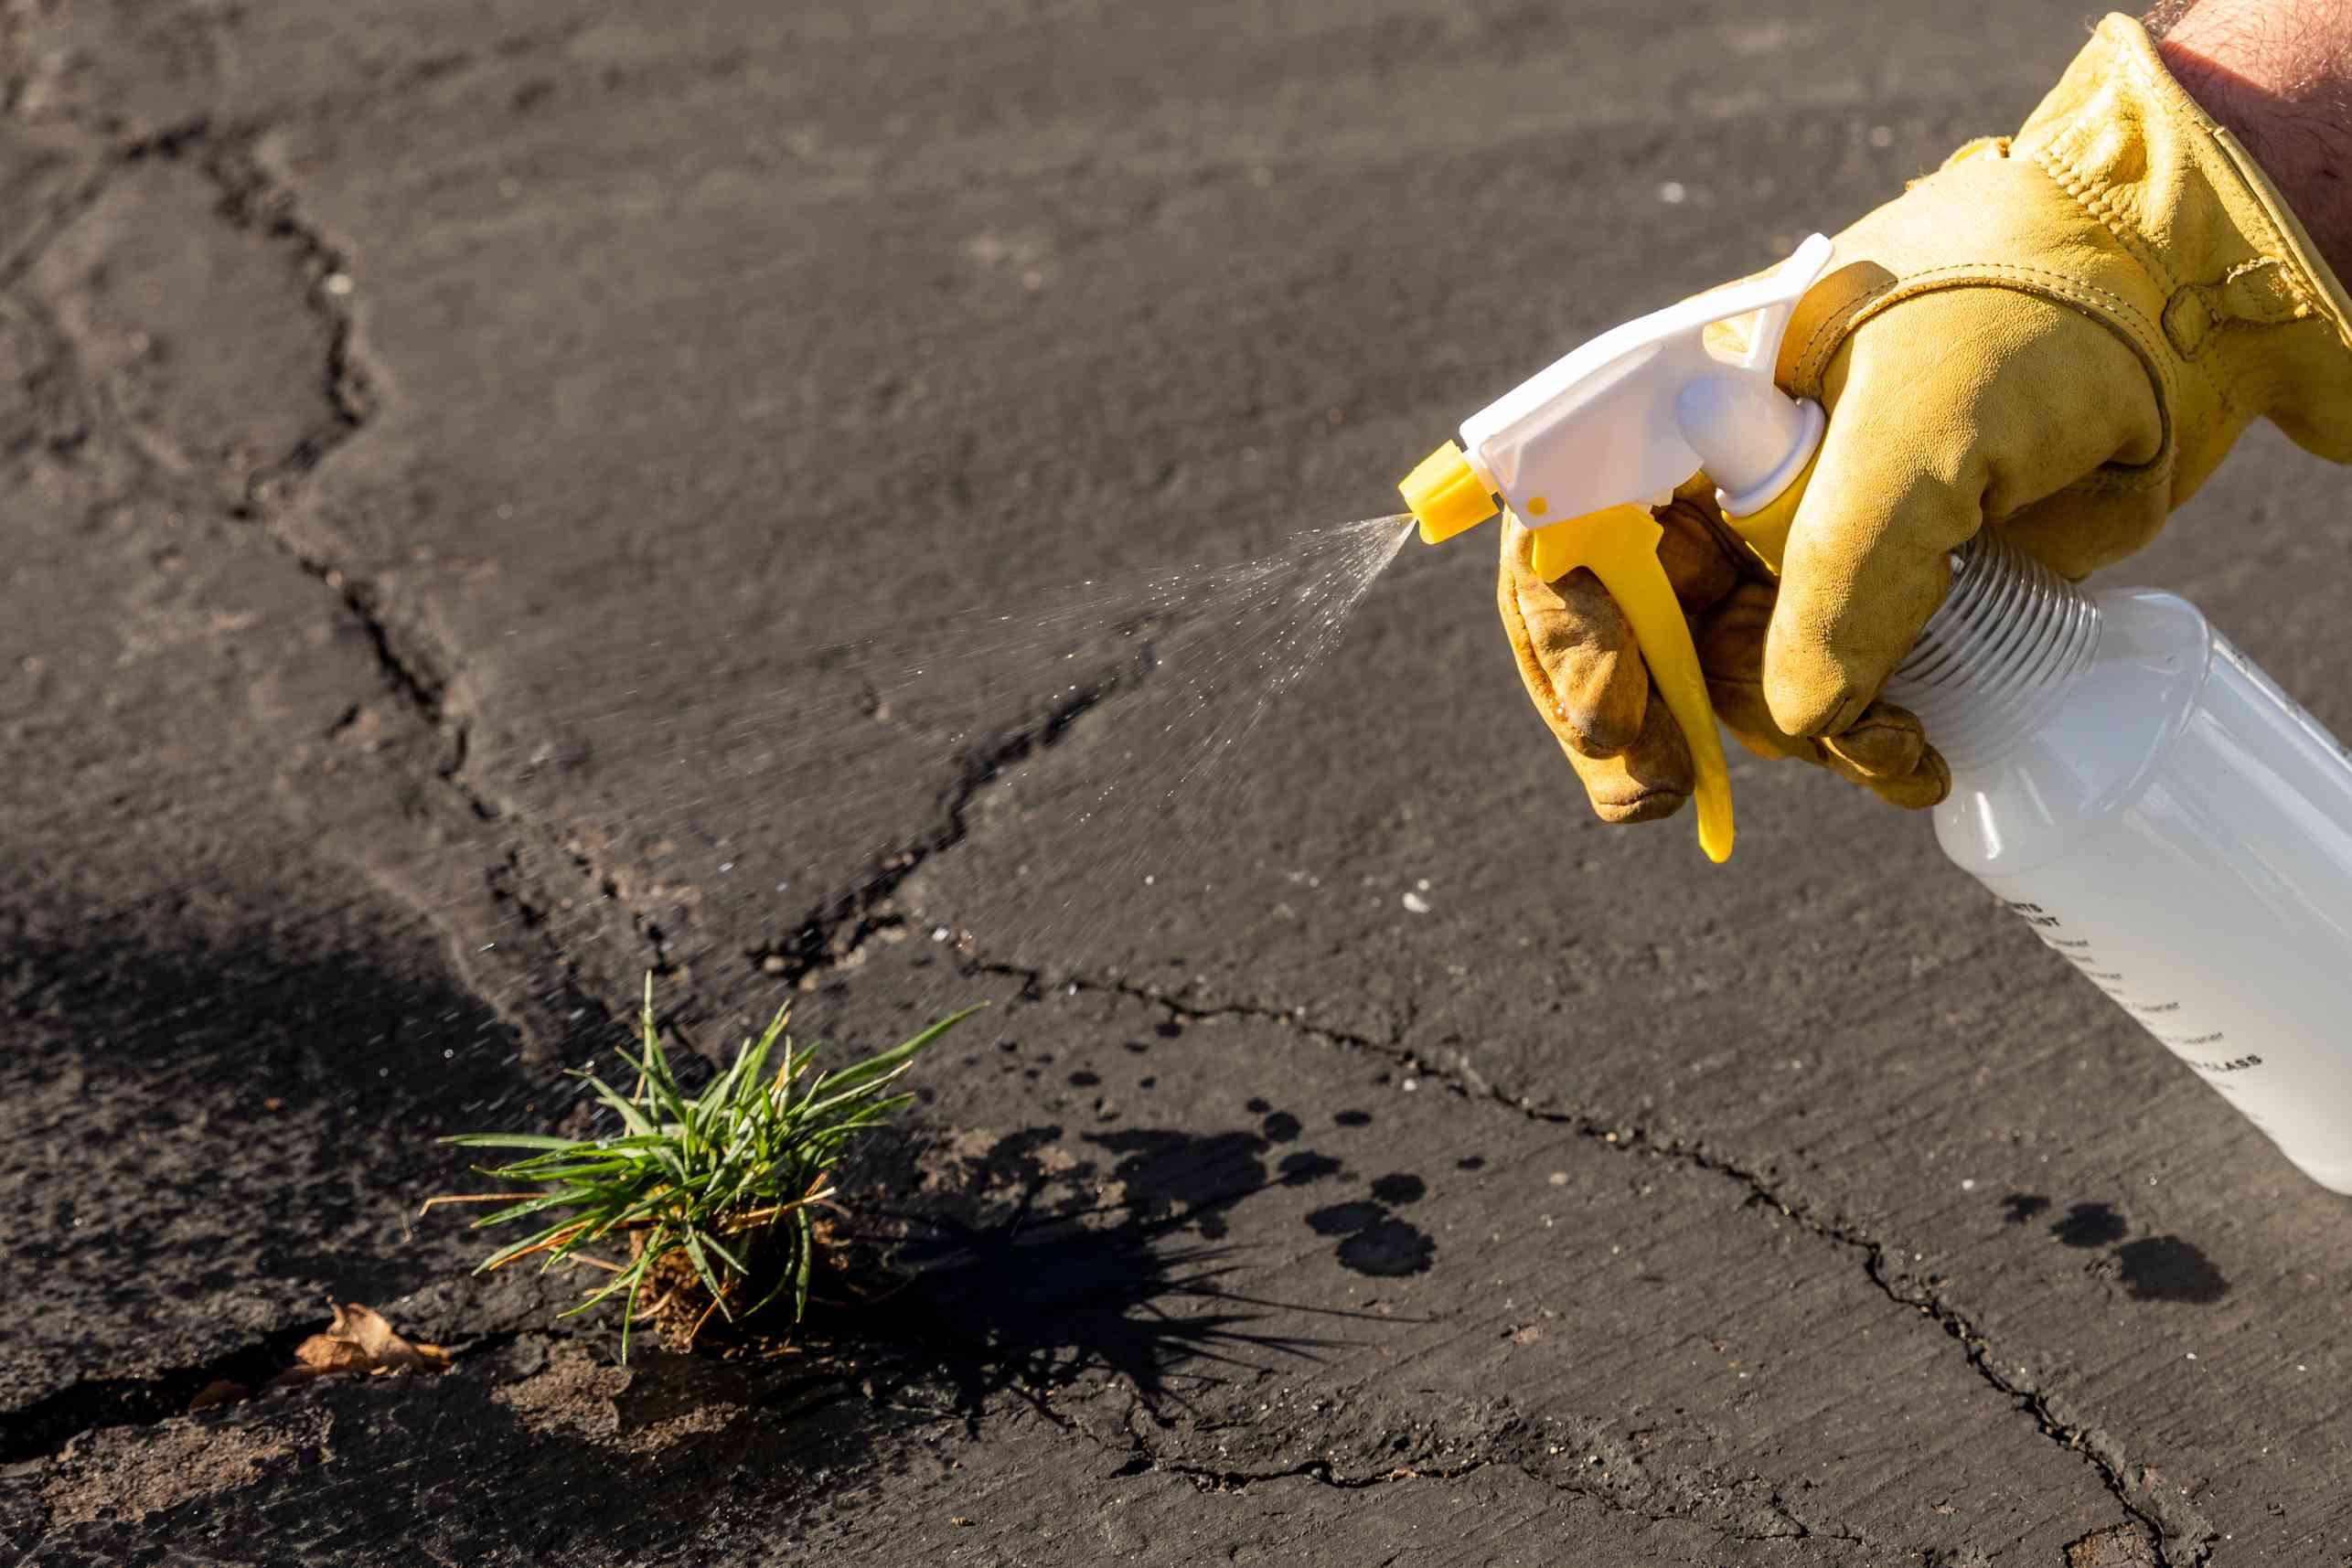 Weeds growing between cement crack sprayed by plastic bottle with mixture